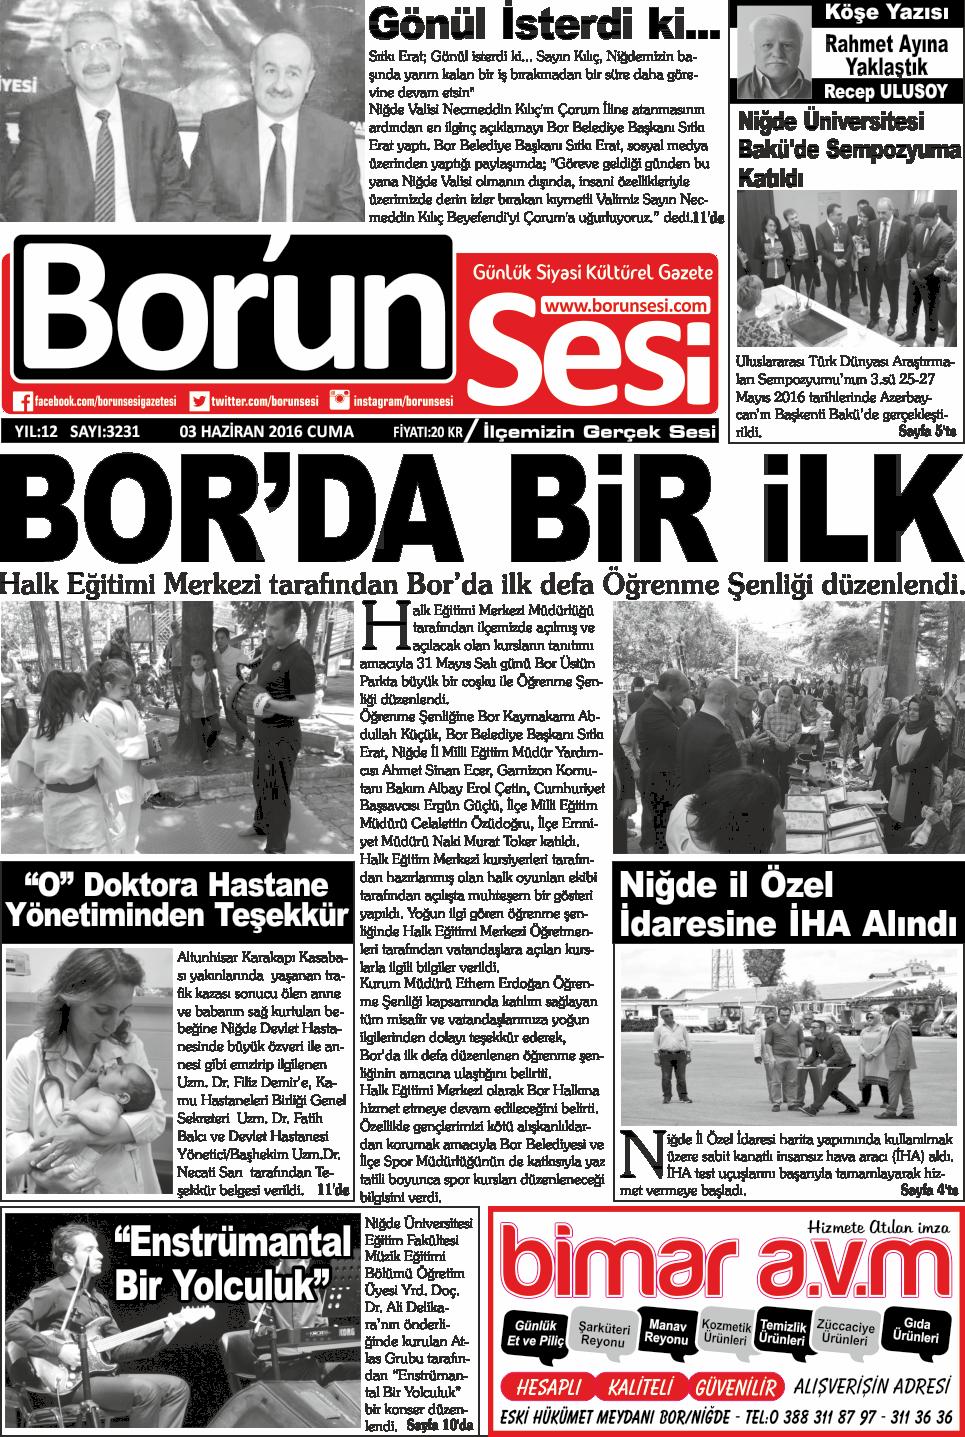 03 Haziran 2016 Cuma Gazete Manşetleri